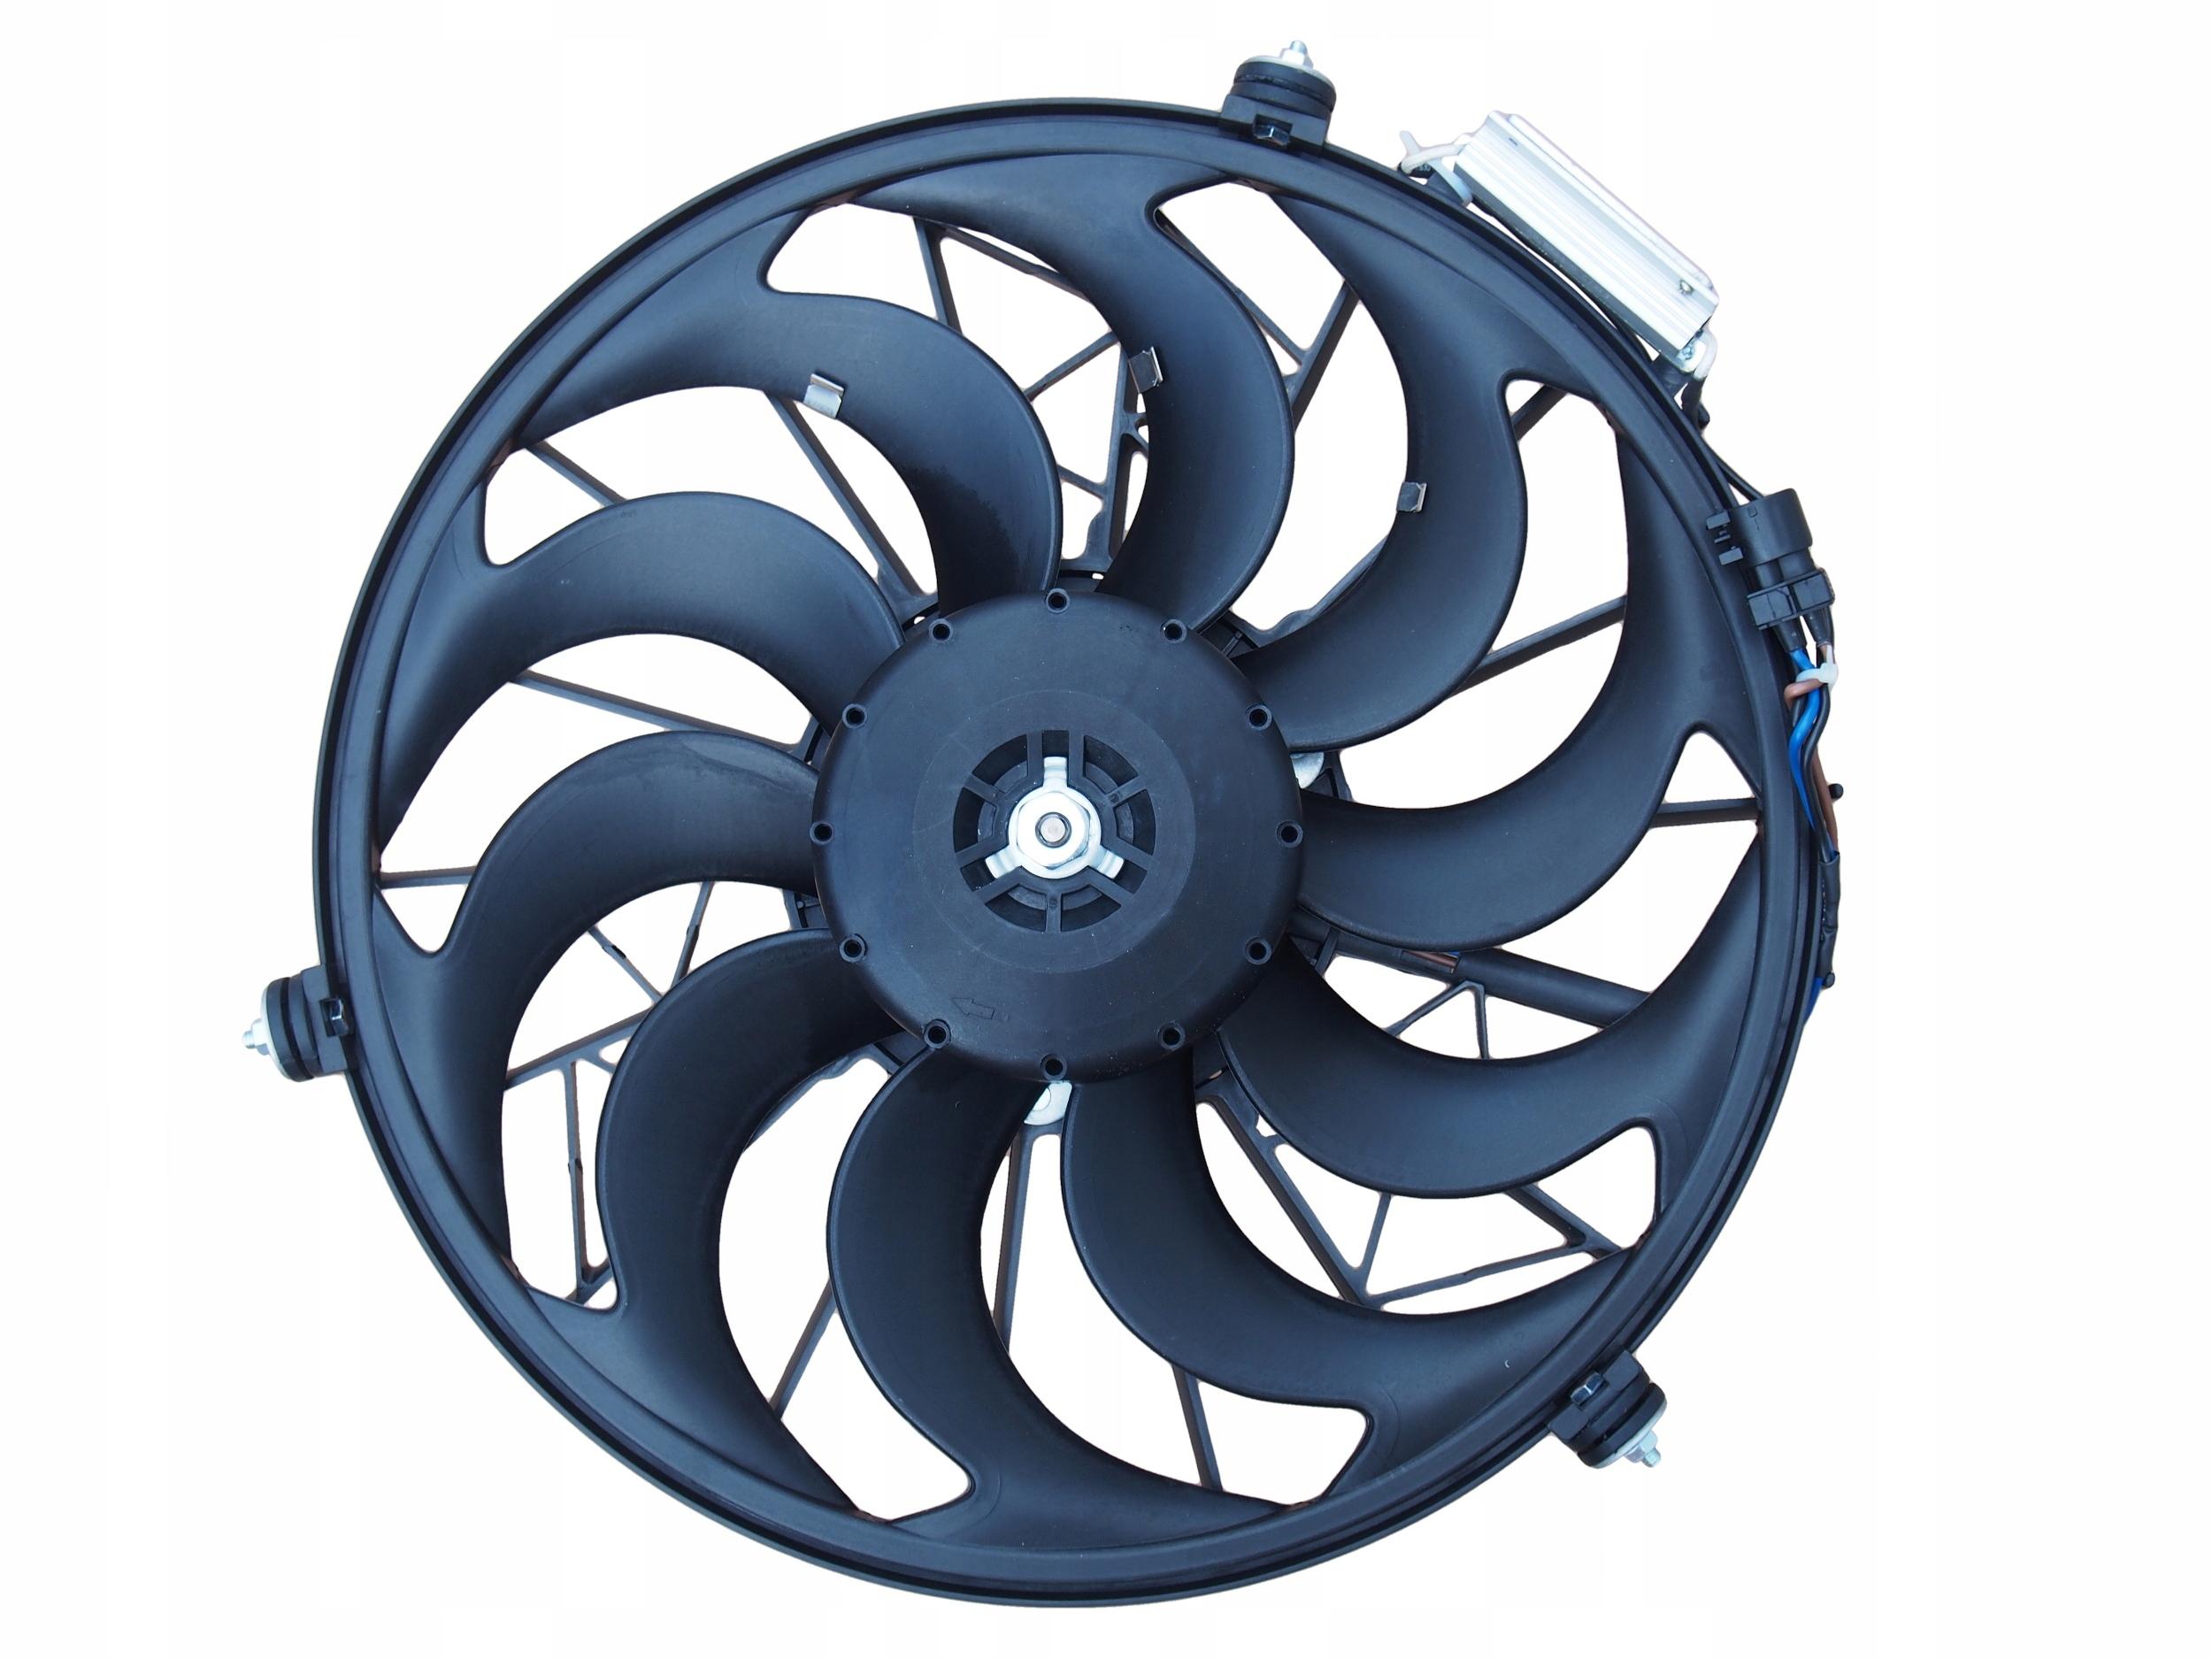 вентилятор кондиционирования воздуха серия 3 5 7 e36 e34 e32